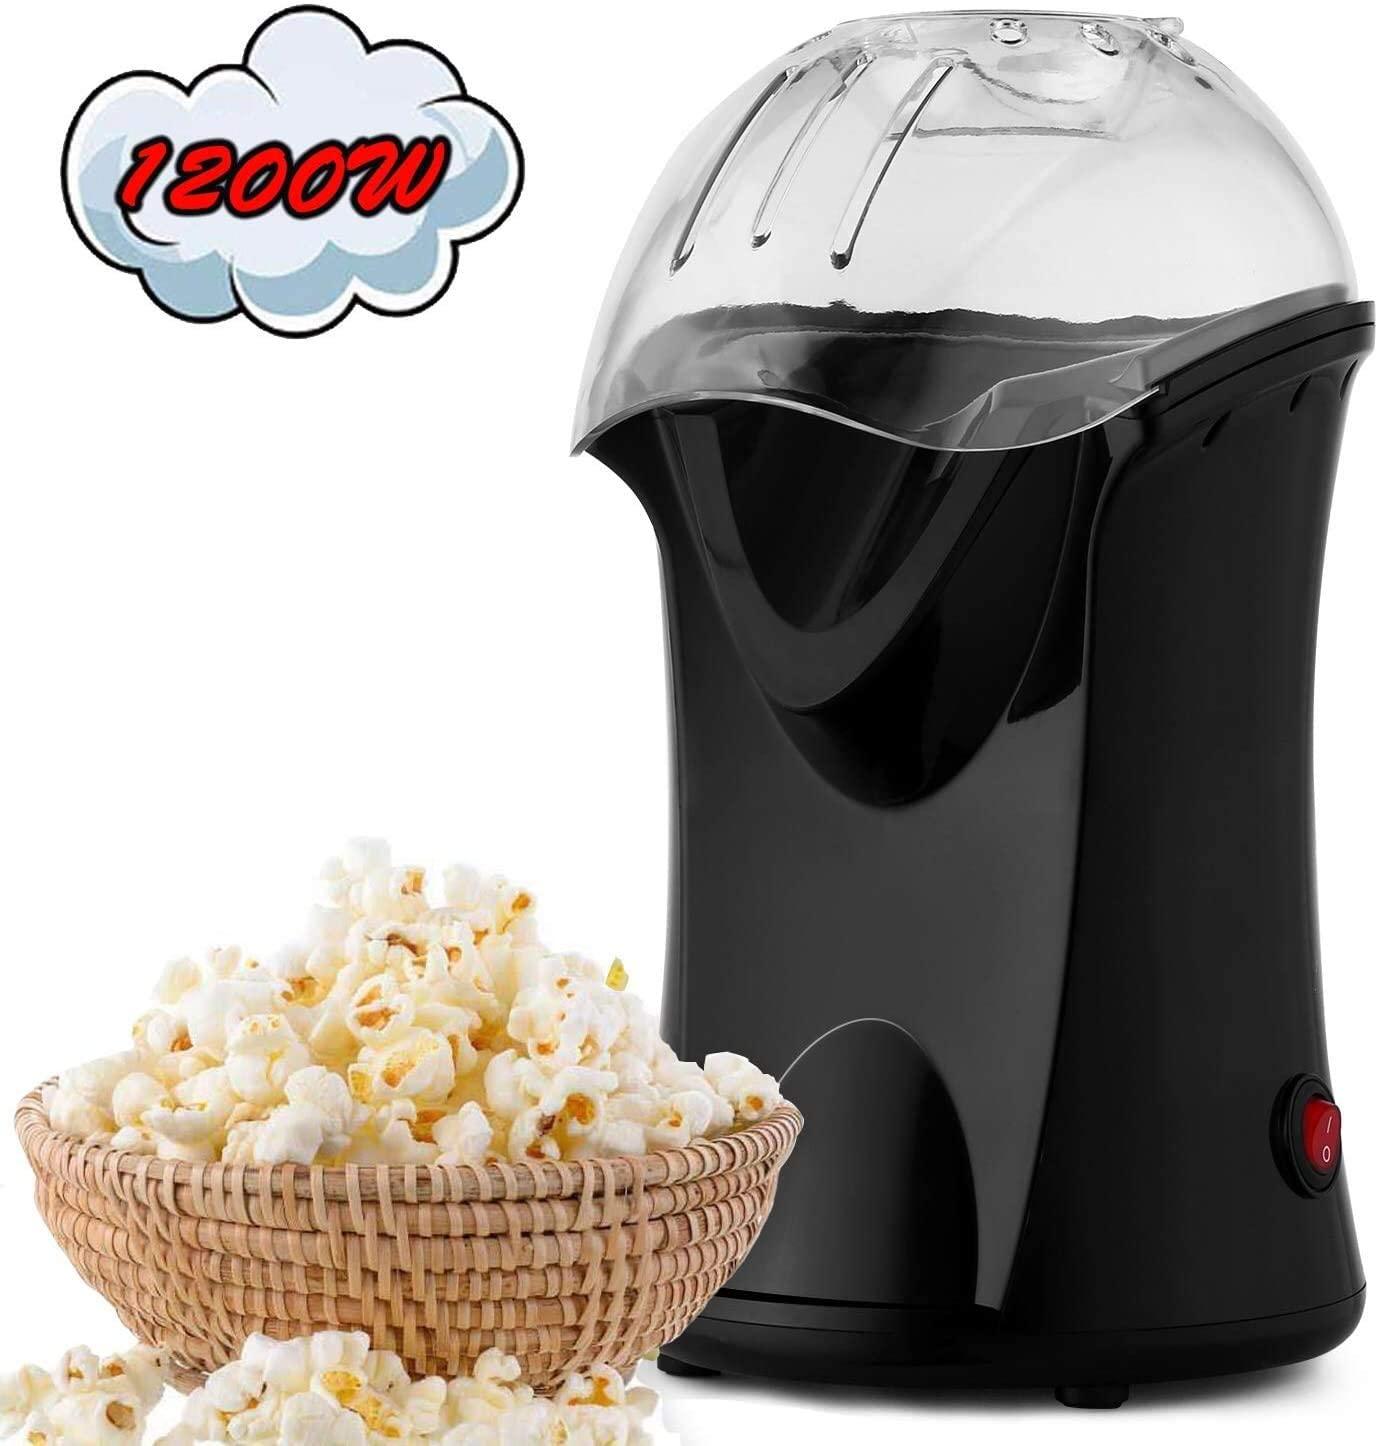 Hot Air Popcorn Popper, Popcorn Machine, 1200W Popcorn Maker for Home Use, No Oil Needed Healthy Popcorn Popper (Black)